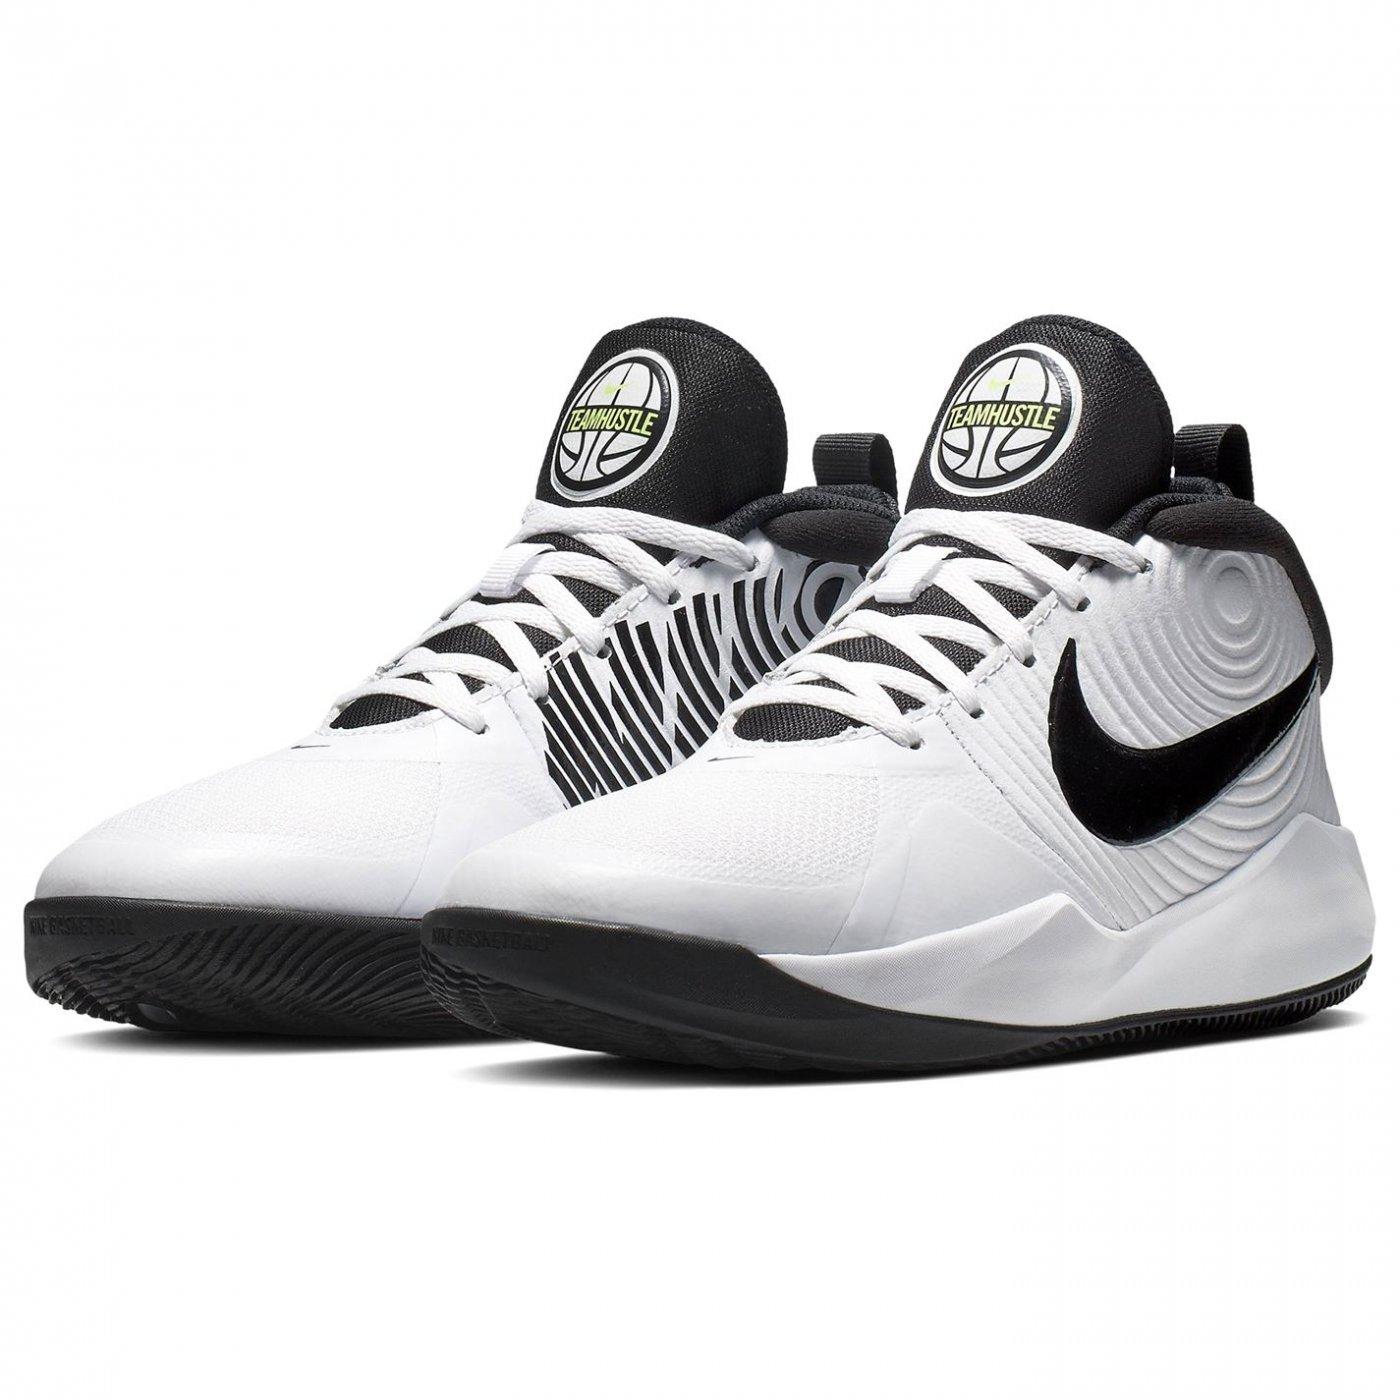 new products a381c e9a9b Nike - Team Hustle D9 Trainers Junior Boys - Glami.hr